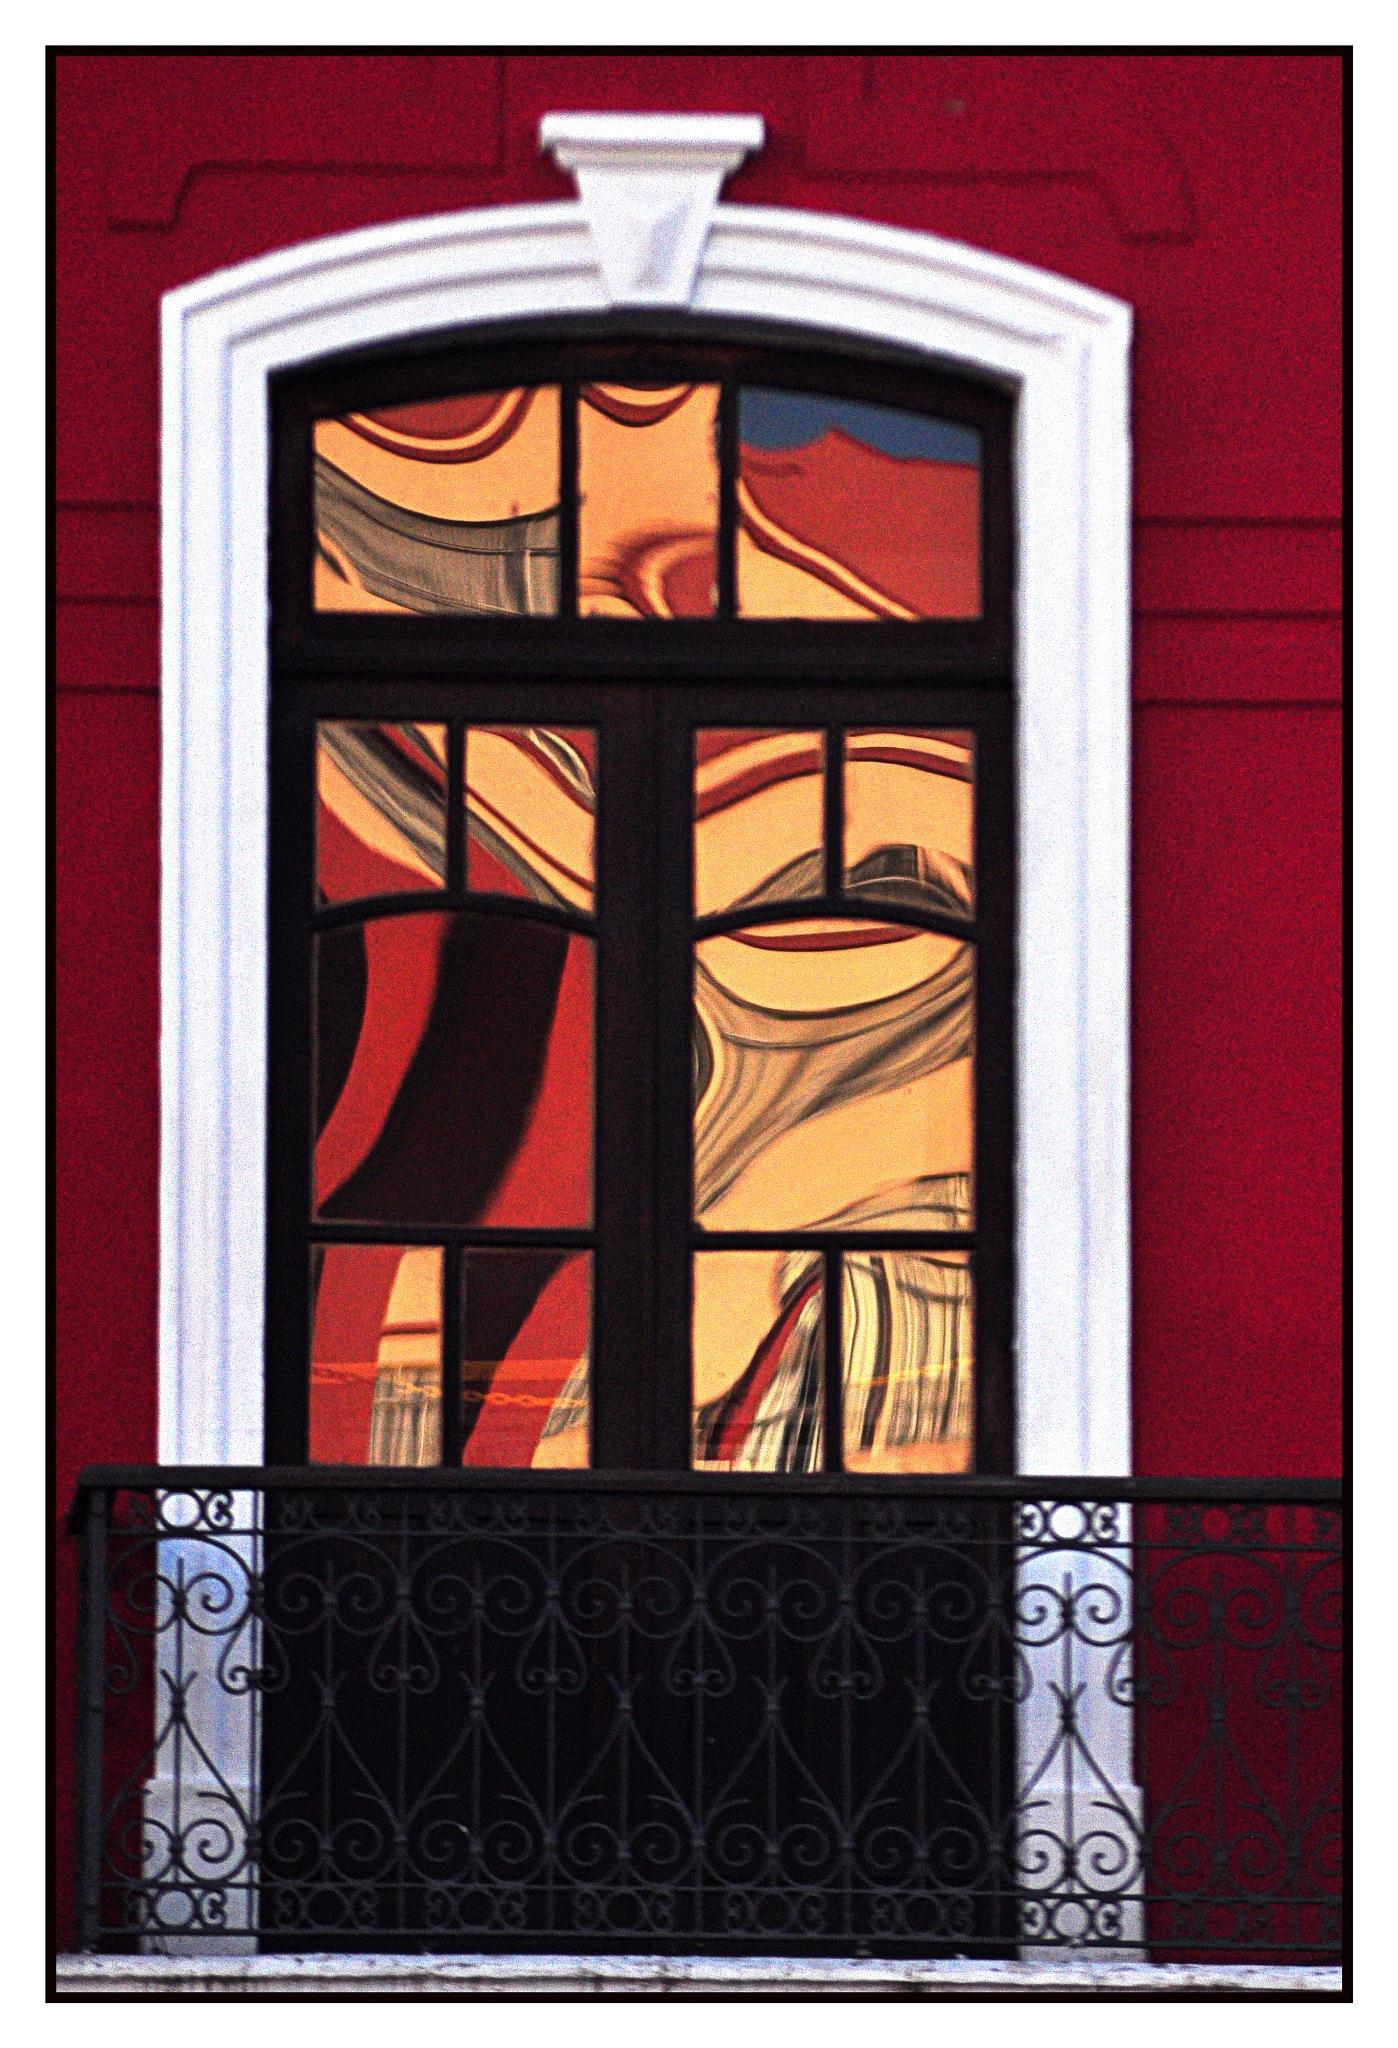 CWB's Window by José Evaldo Suassuna de Oliveira